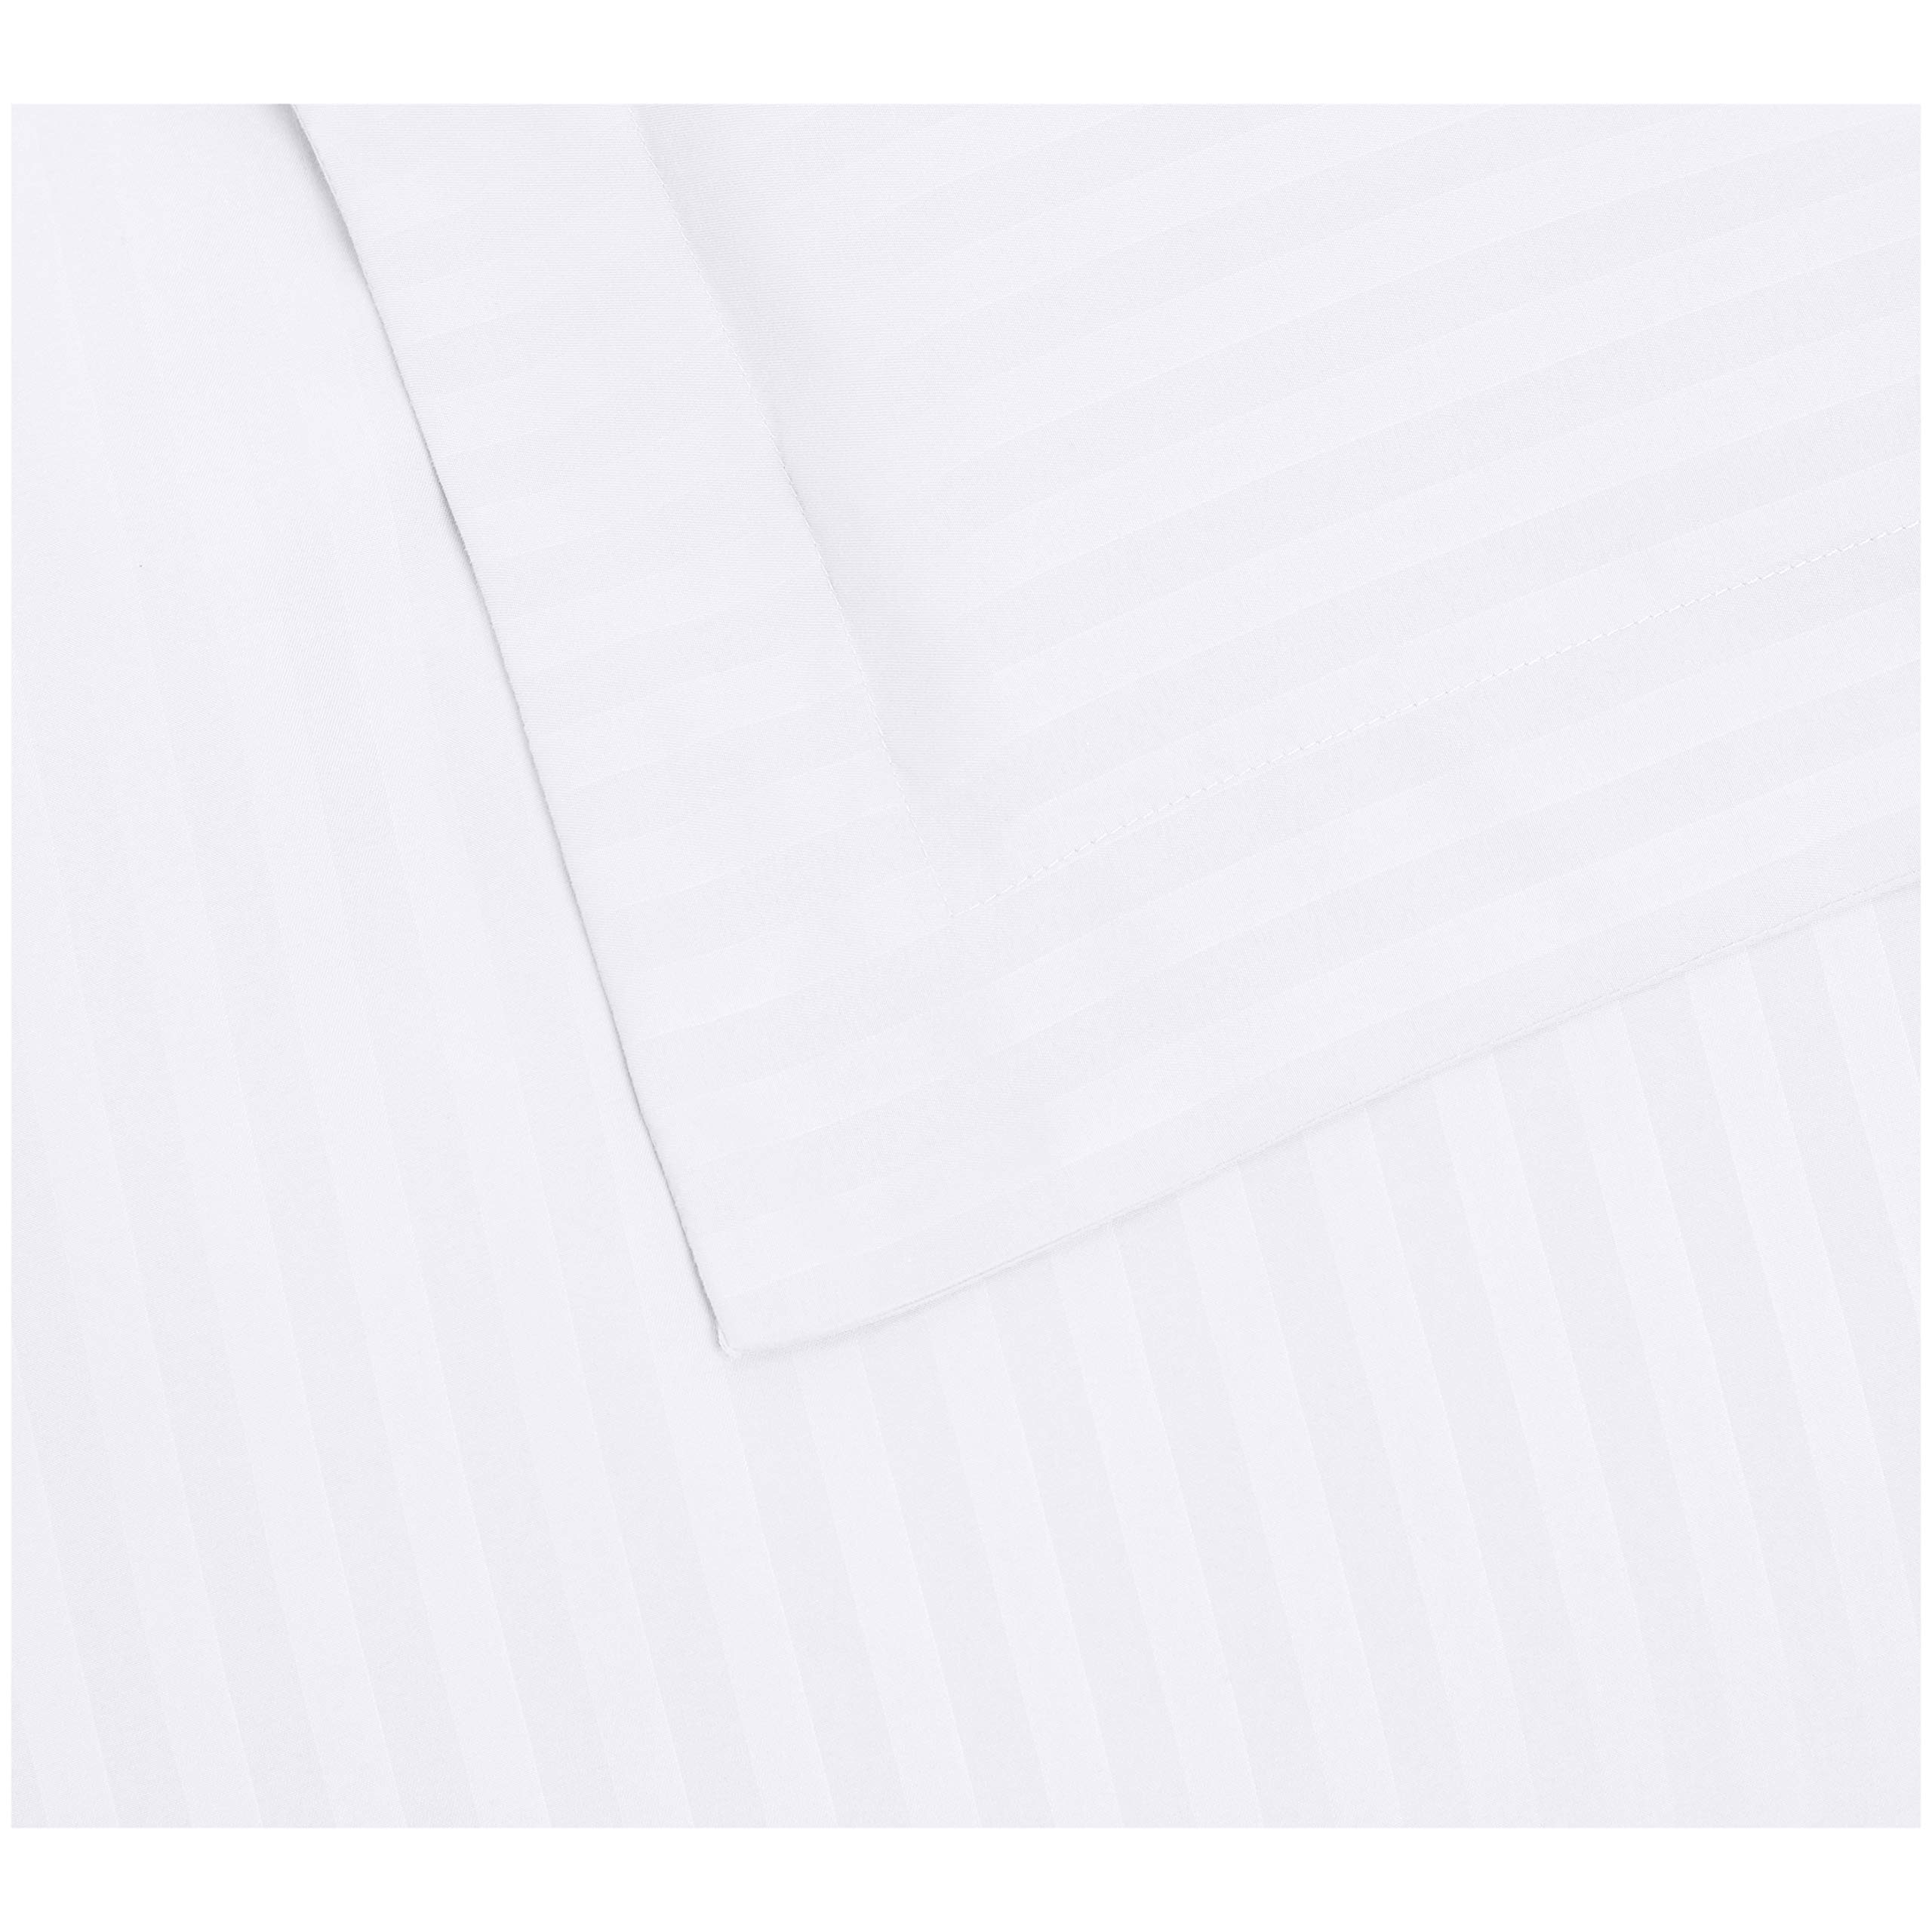 AmazonBasics Deluxe Striped Microfiber Duvet Cover Set - Full or Queen, Bright White by AmazonBasics (Image #5)